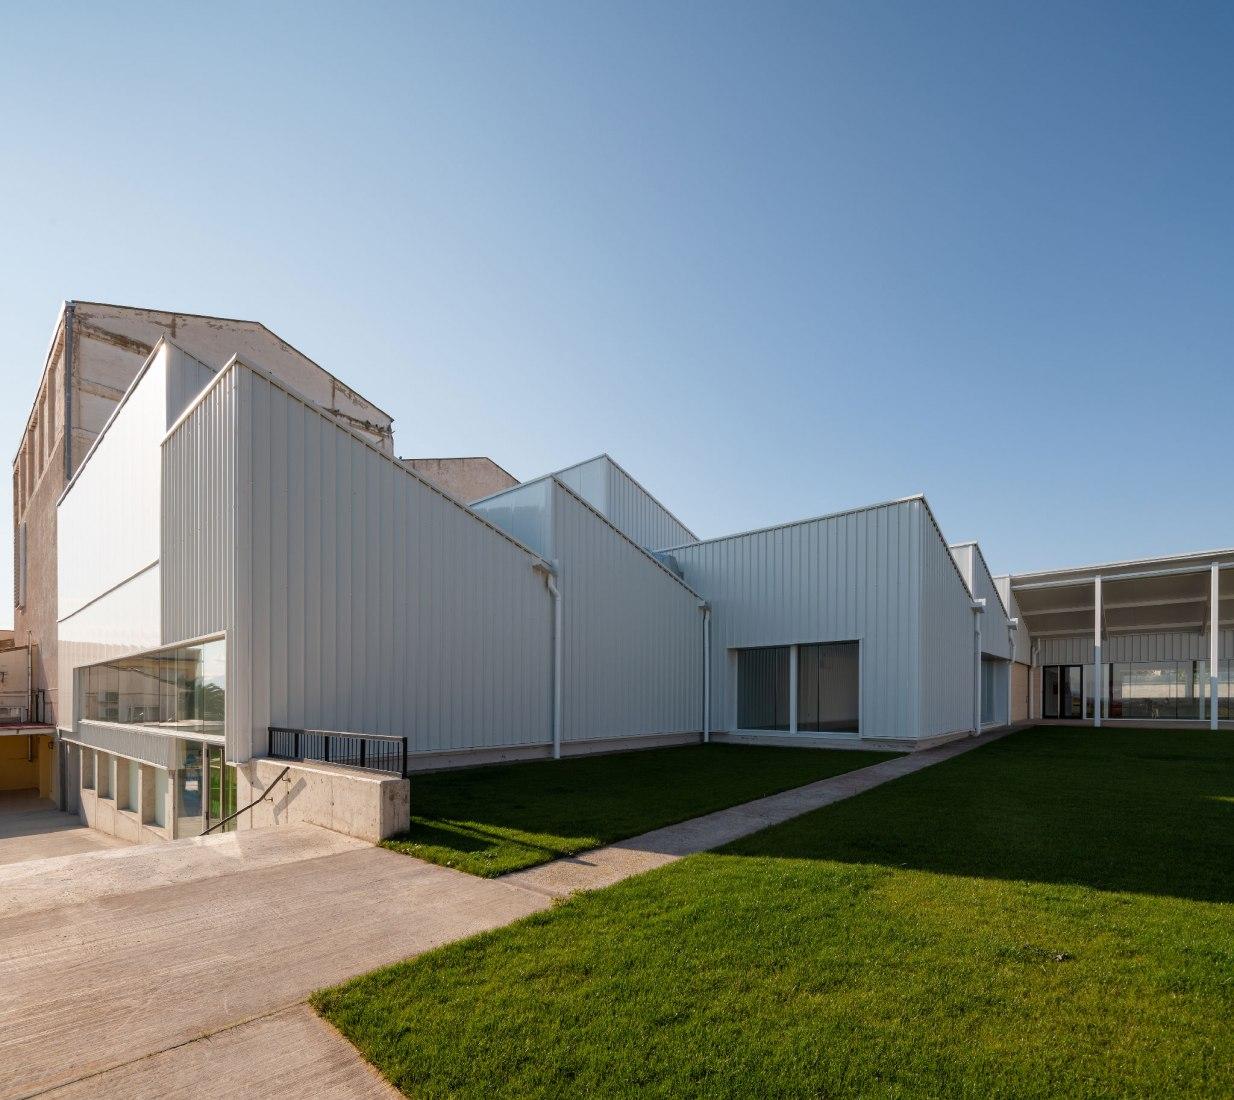 Sports Pavilion by Blasco Esparza Arquitectos. Photograph by Pedro Pegenaute